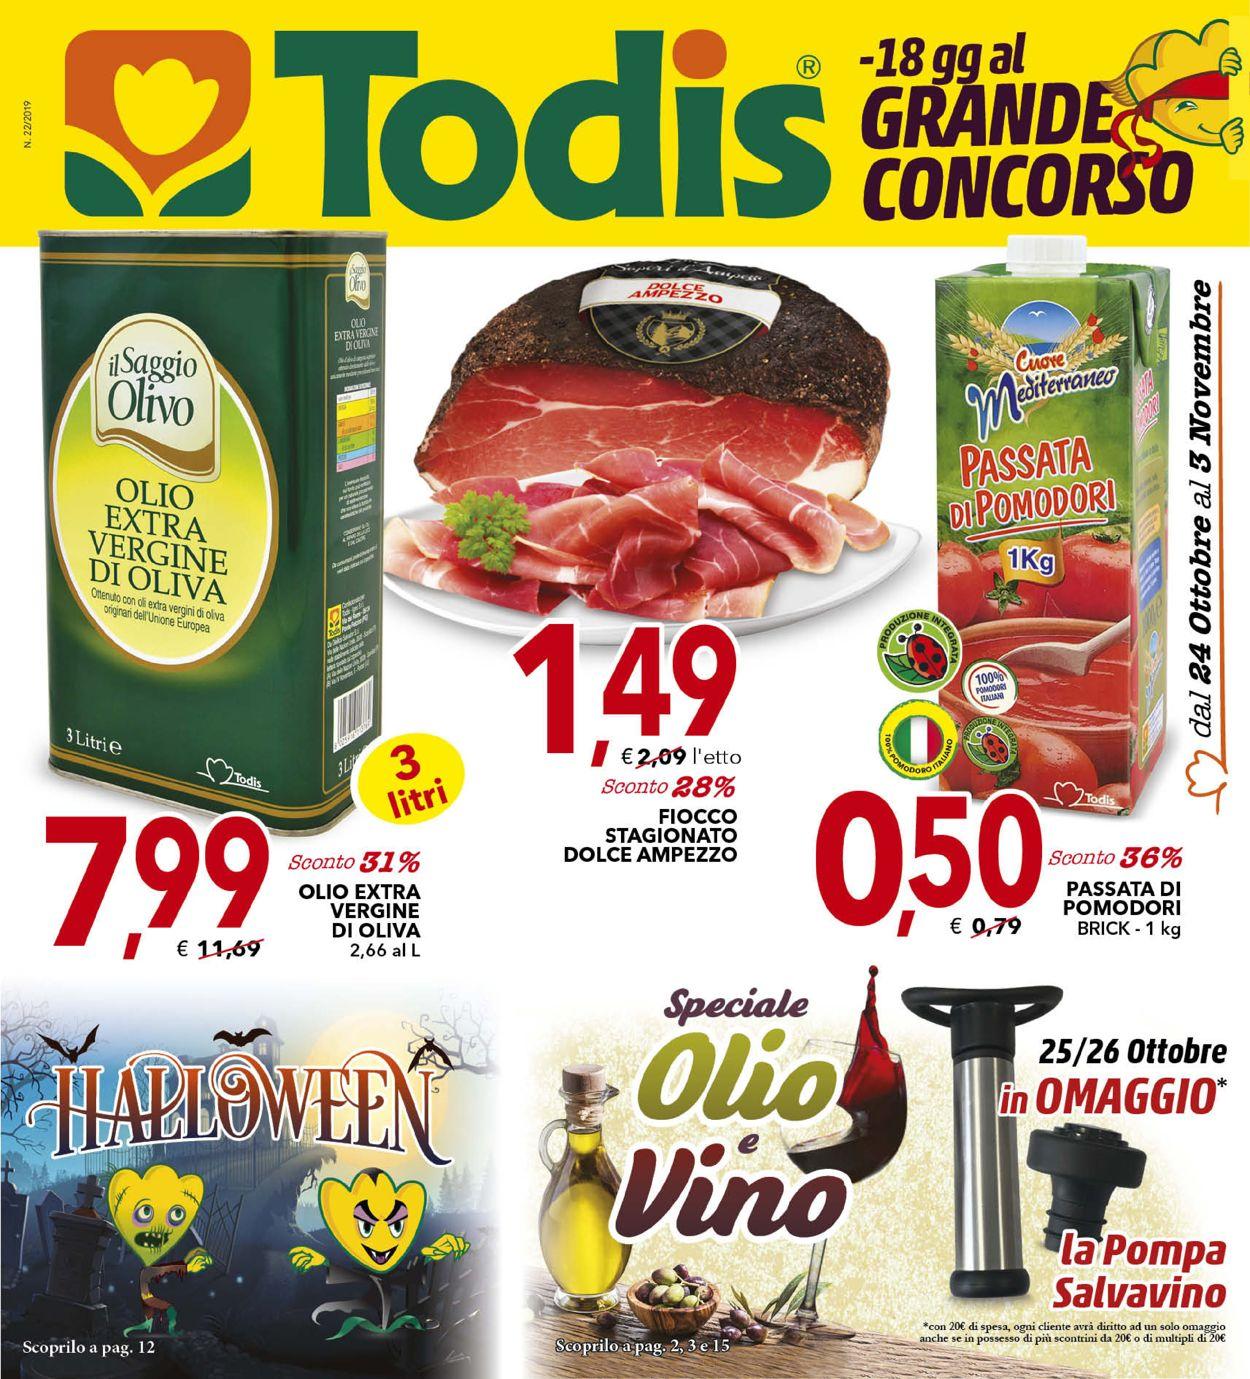 Volantino Todis - Offerte 24/10-03/11/2019